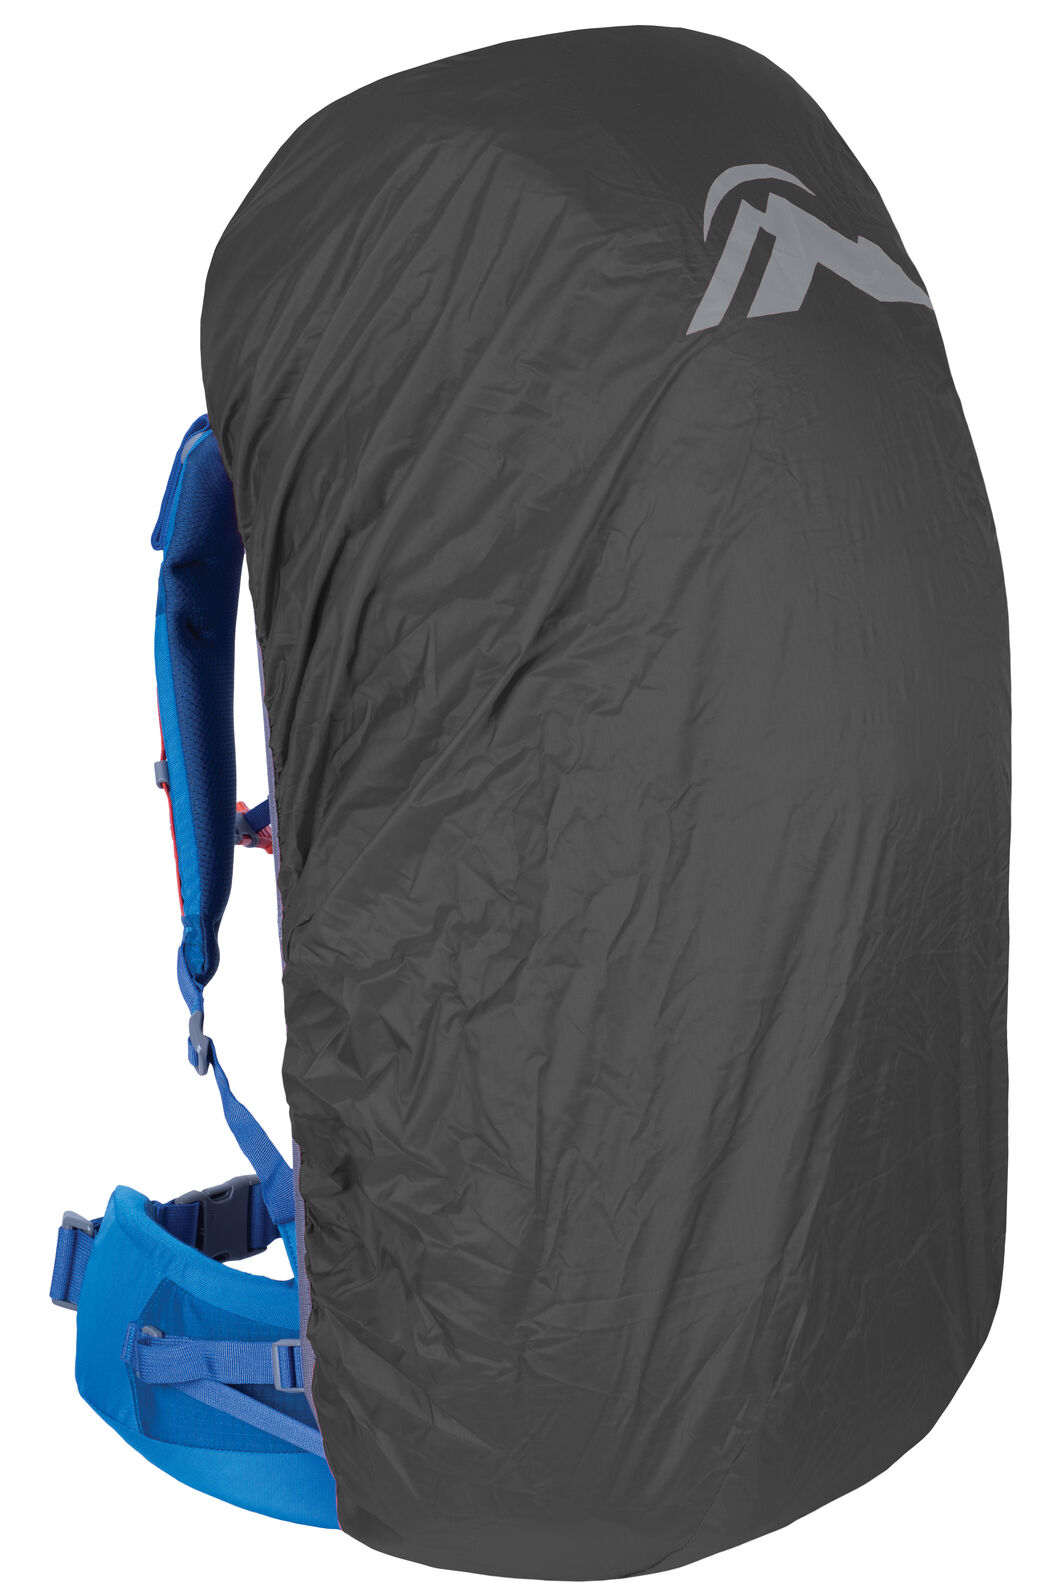 Macpac Pack Raincover Large, Charcoal, hi-res